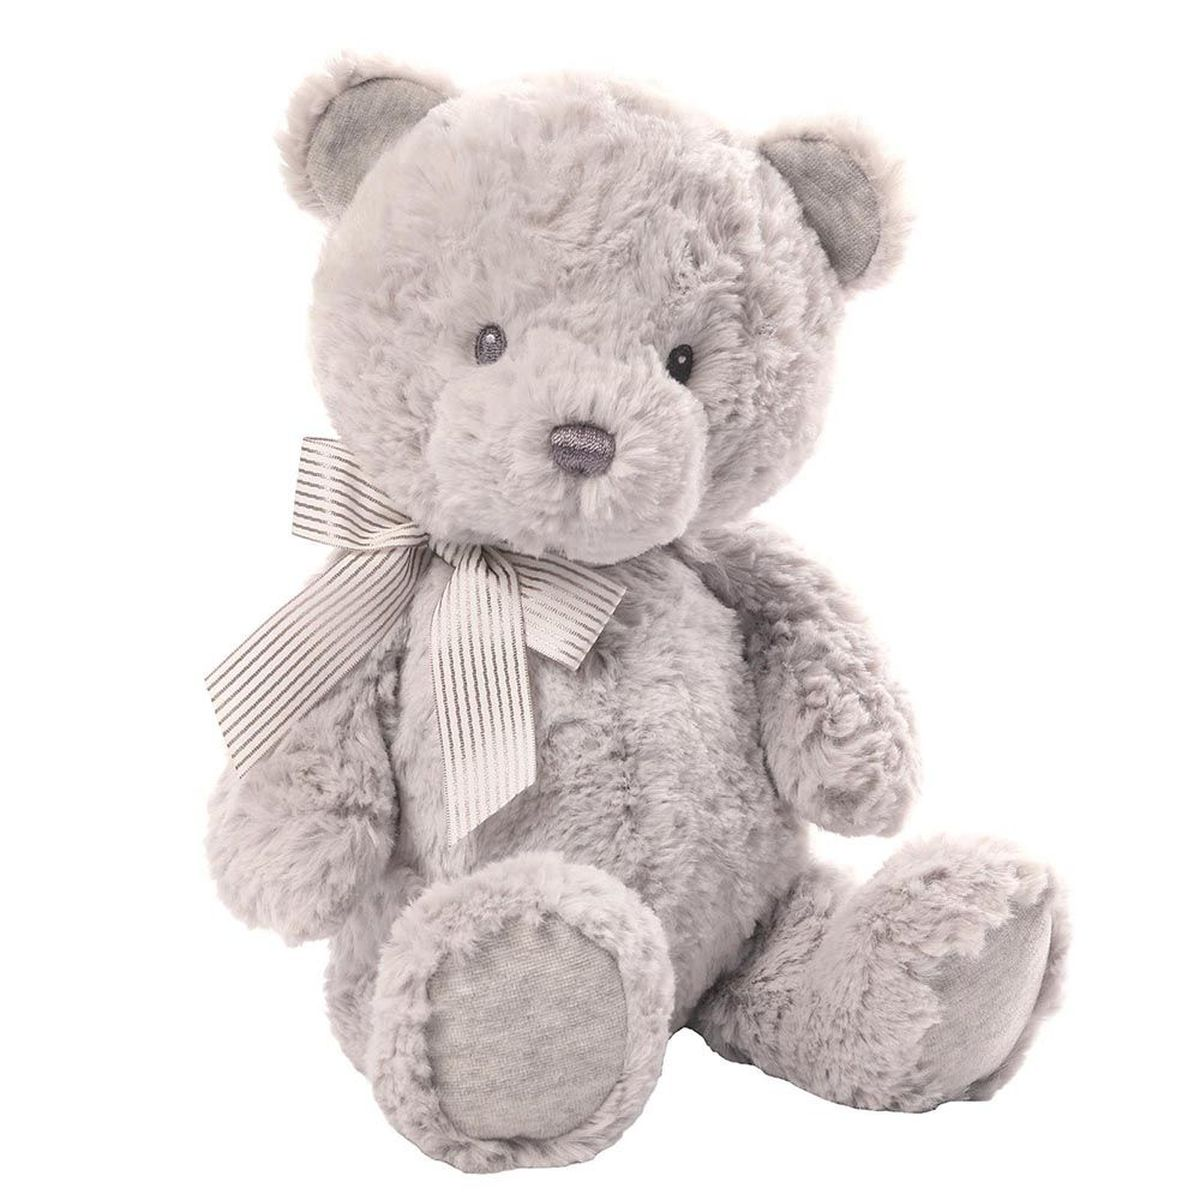 Gund Мягкая игрушка Grayson Bear Medium 33 см gund мягкая игрушка arlo bear 18 см